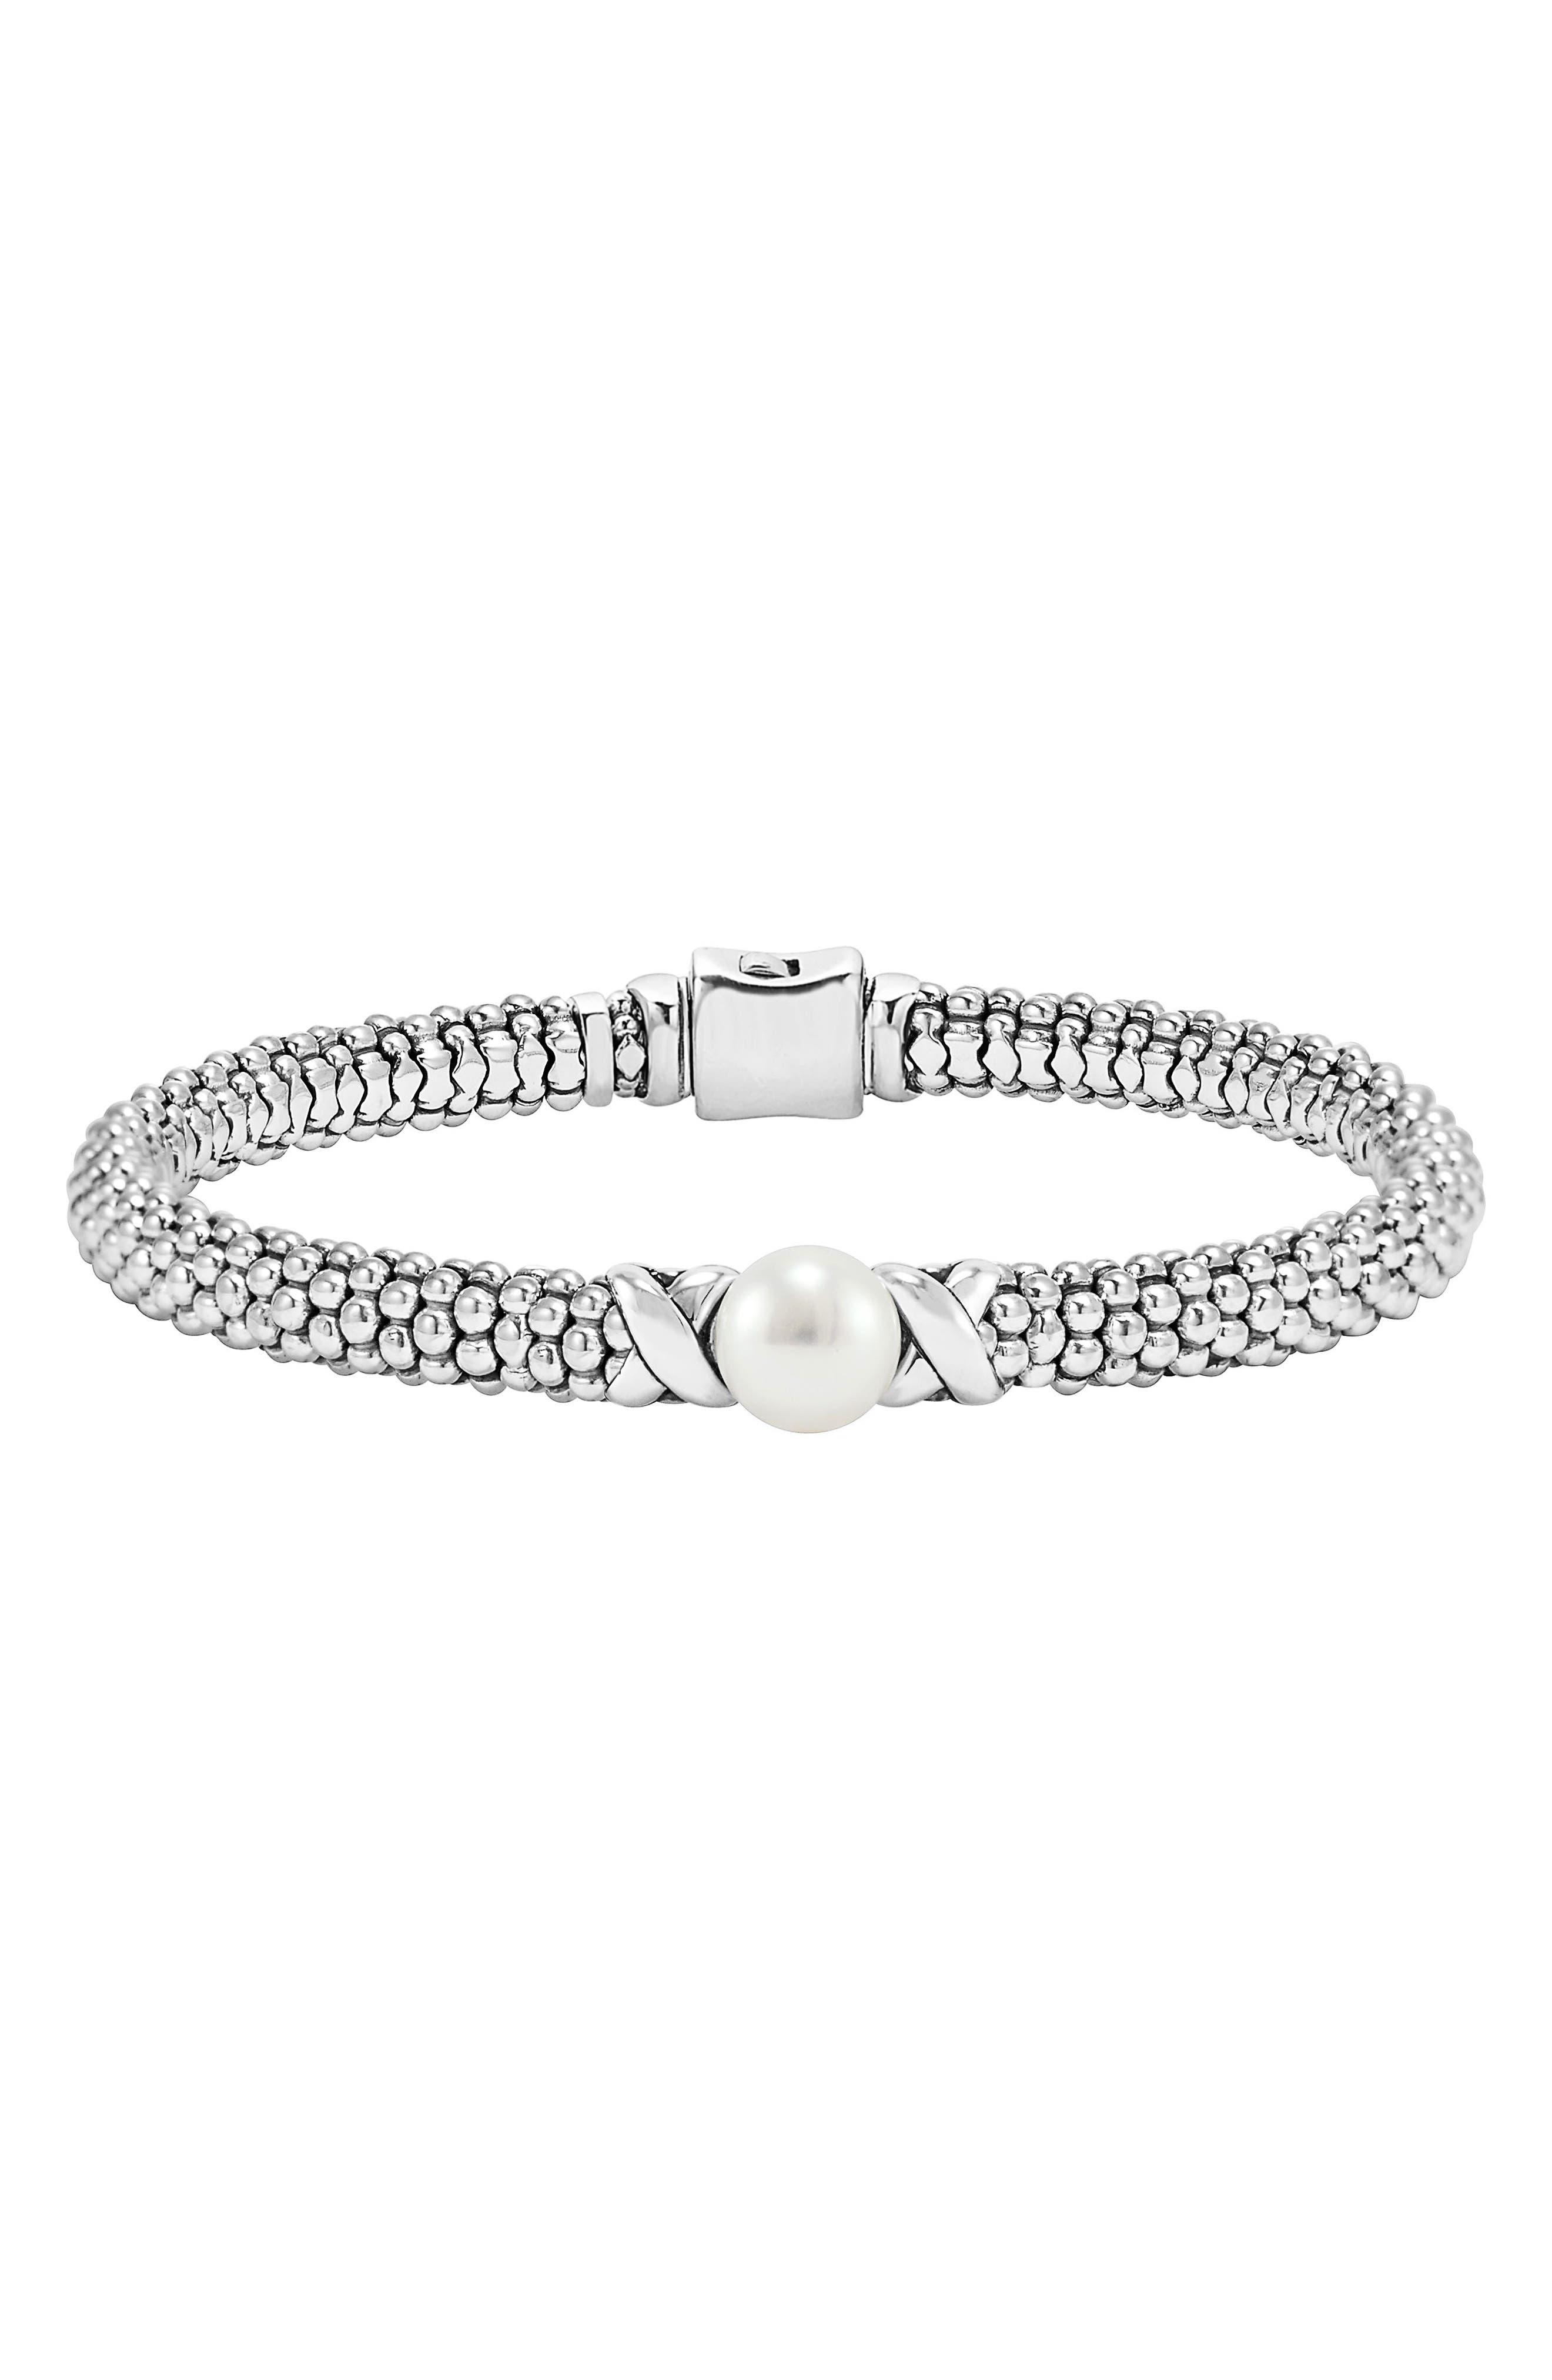 'Luna' Pearl Rope Bracelet,                             Main thumbnail 1, color,                             SILVER/ PEARL